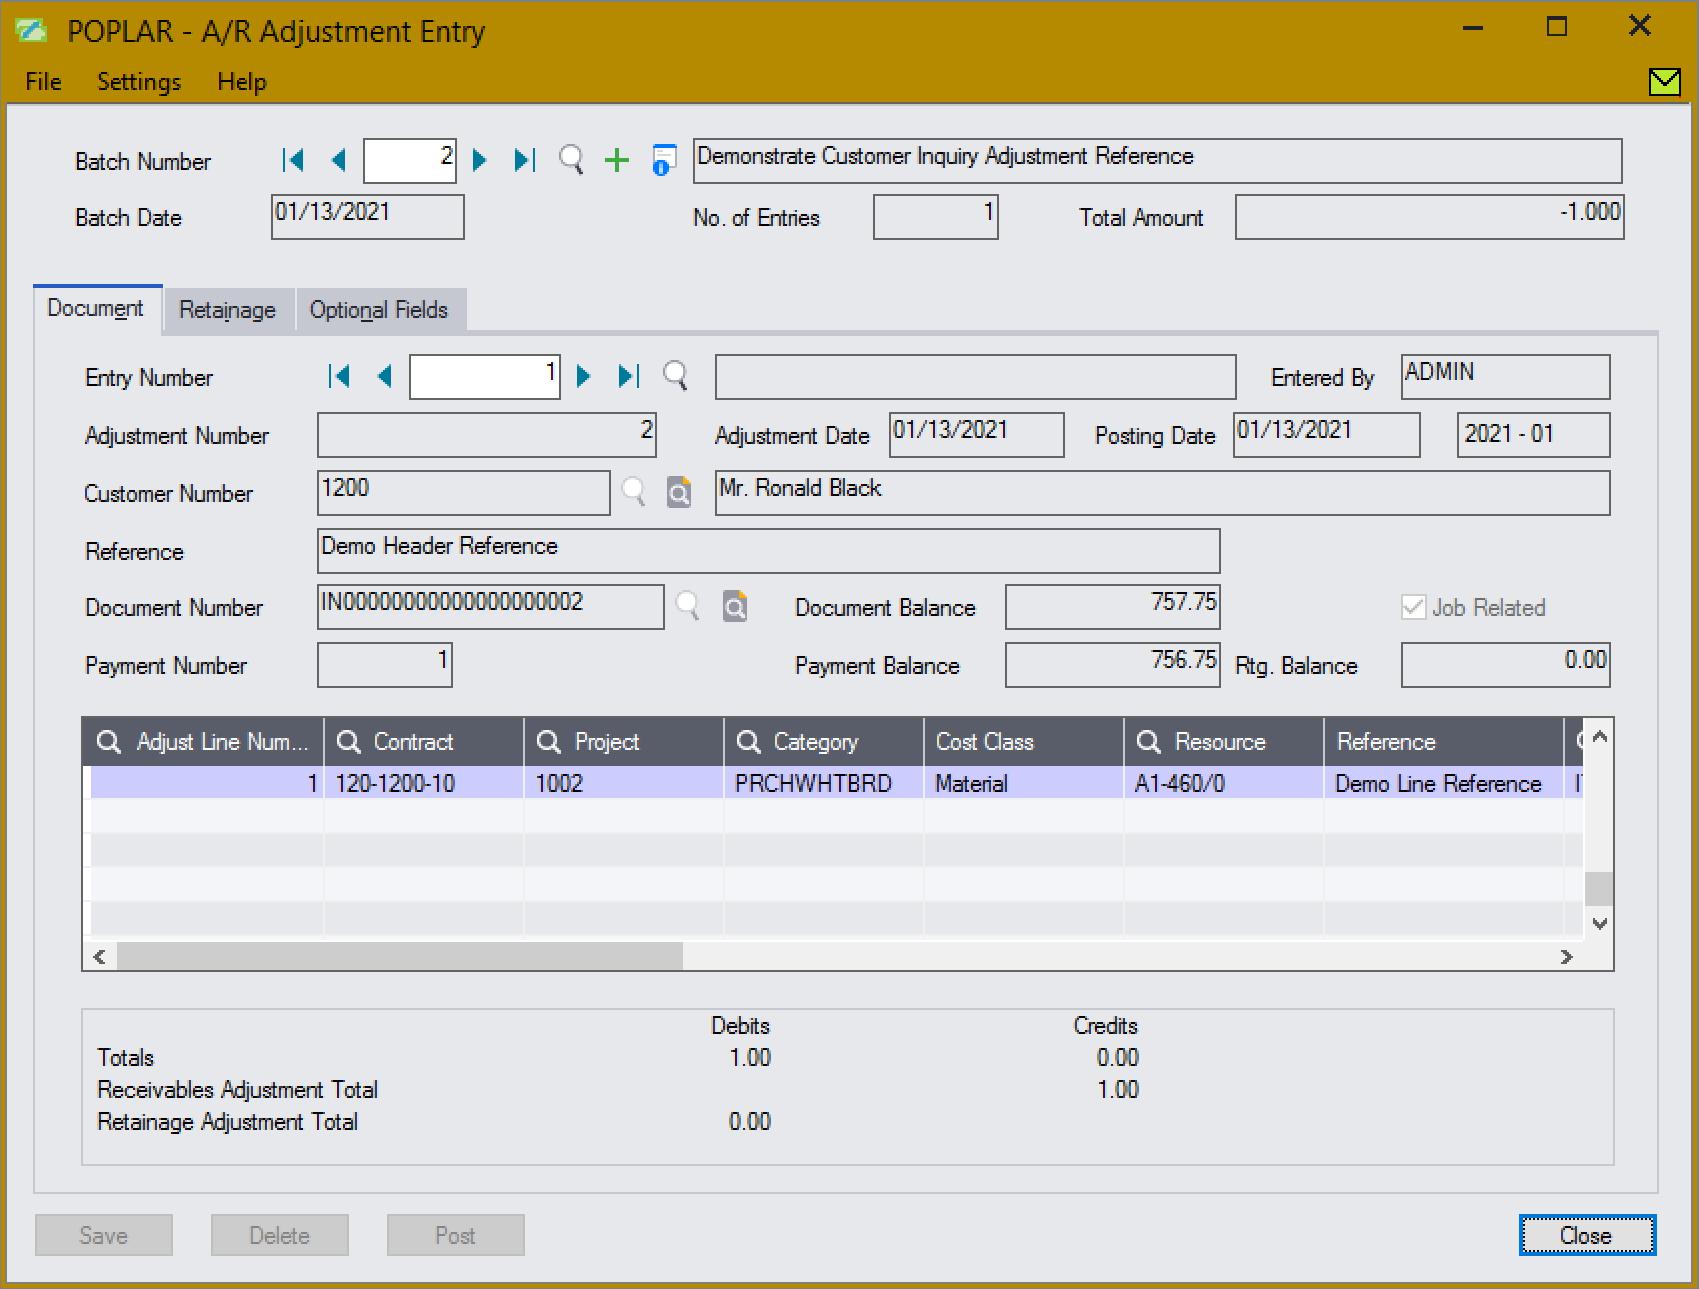 Screenshot of A/R Adjustment Entry